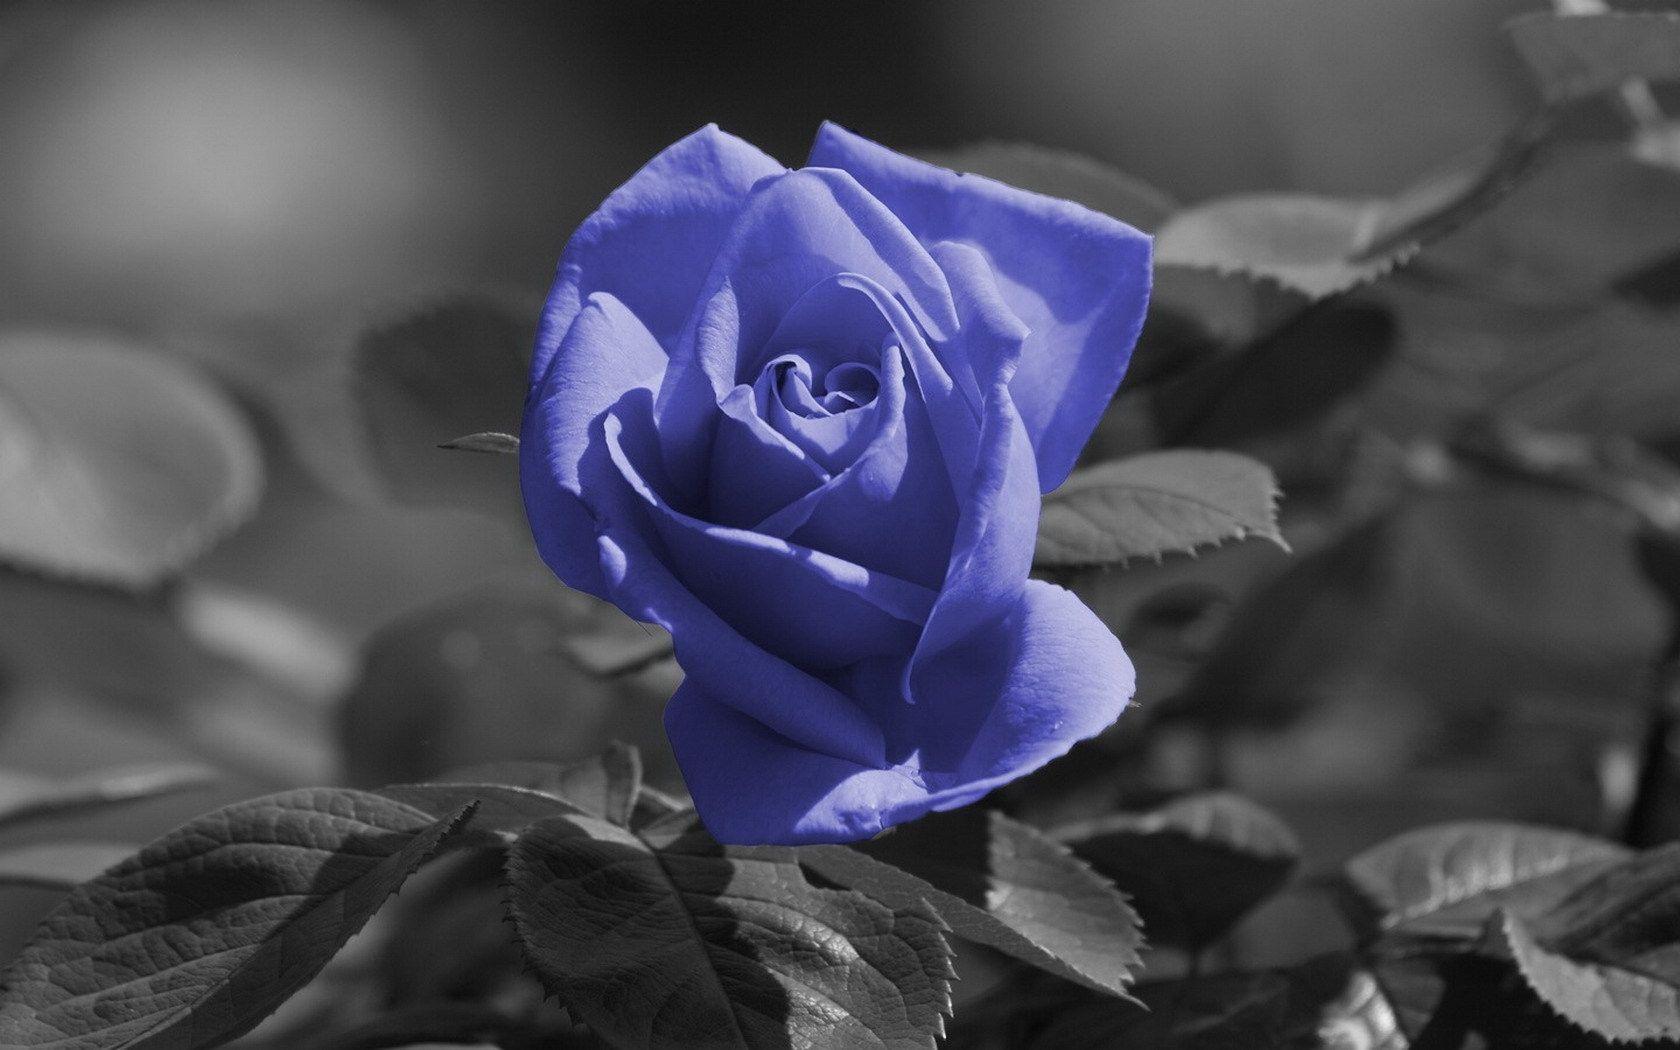 Image Detail For Wallpaper Original Rose Flower Blue Black White Frame Background Color Splash Black And White Roses Amazing Flowers